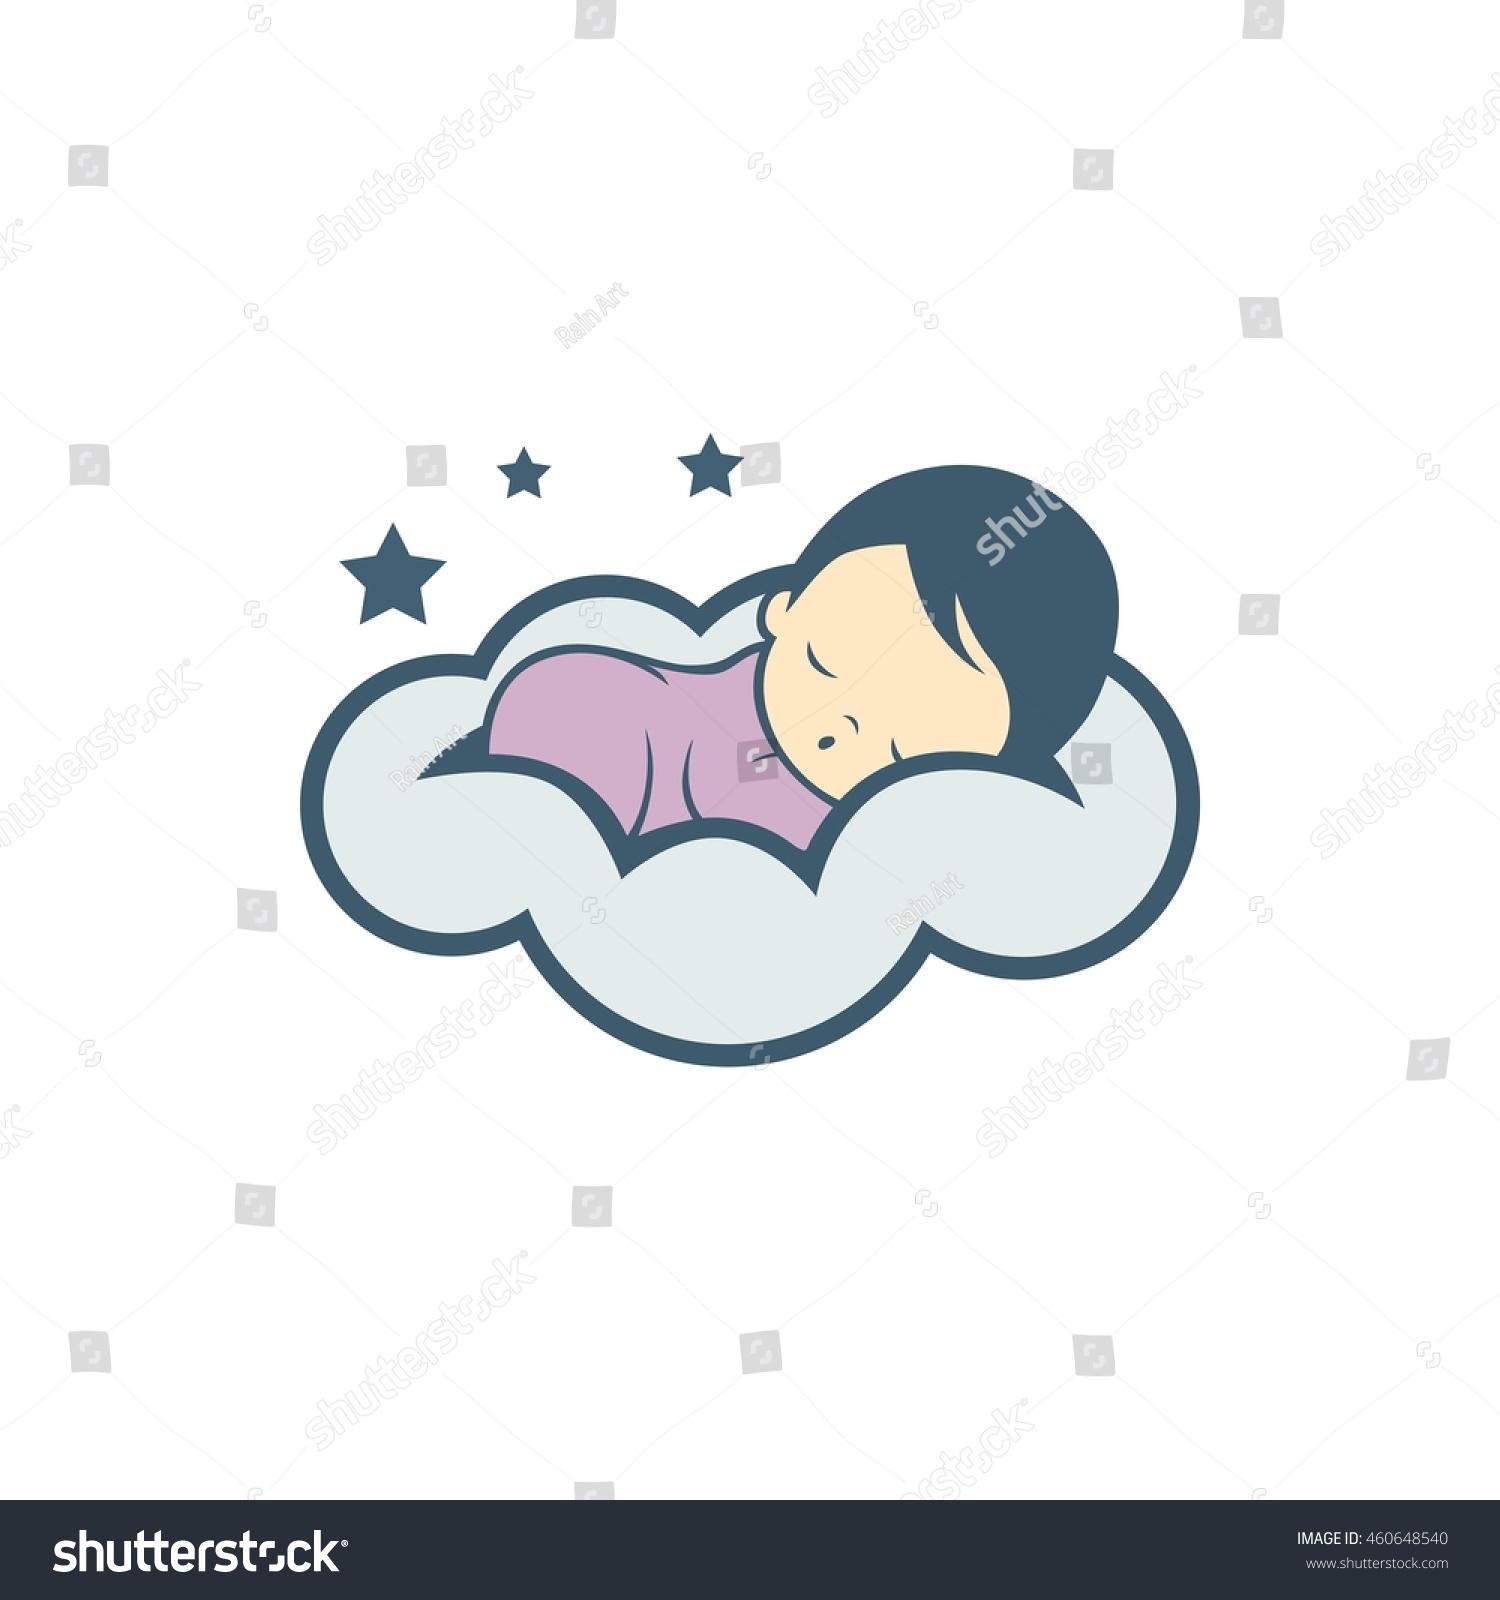 Sleep baby logo icon        - Vector